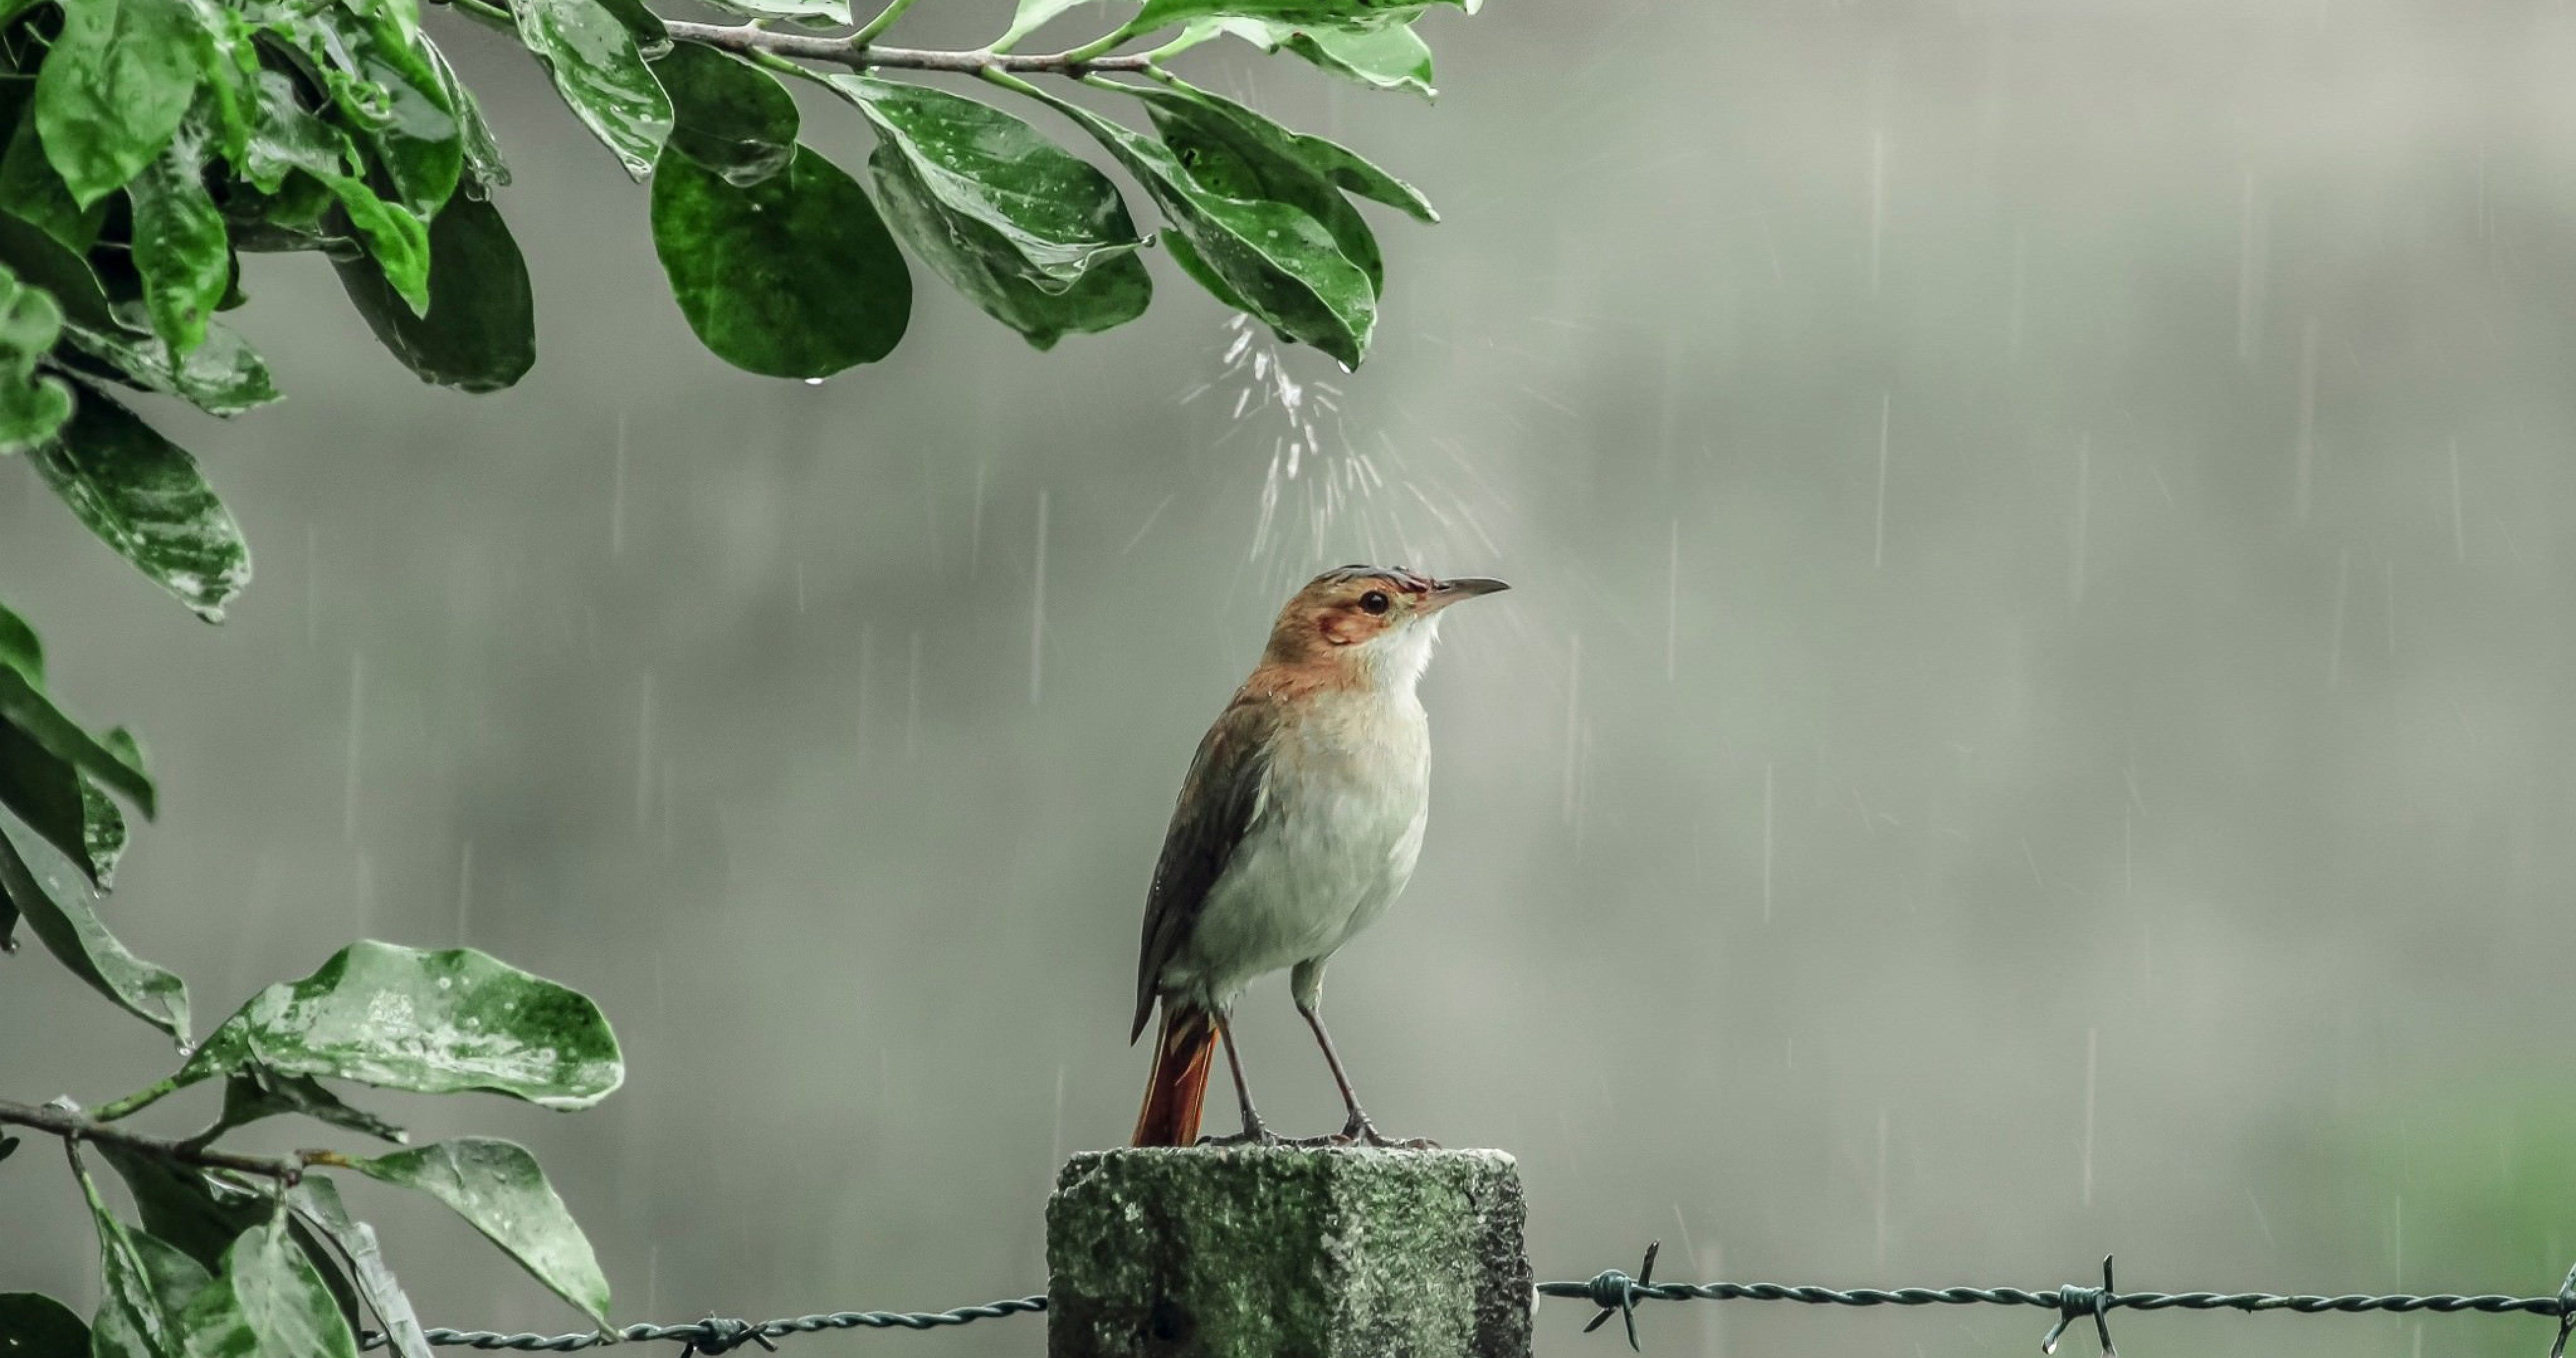 Bird On Rain 4k Ultra Hd Wallpaper Rain Wallpapers Wallpaper Pictures Beautiful Birds